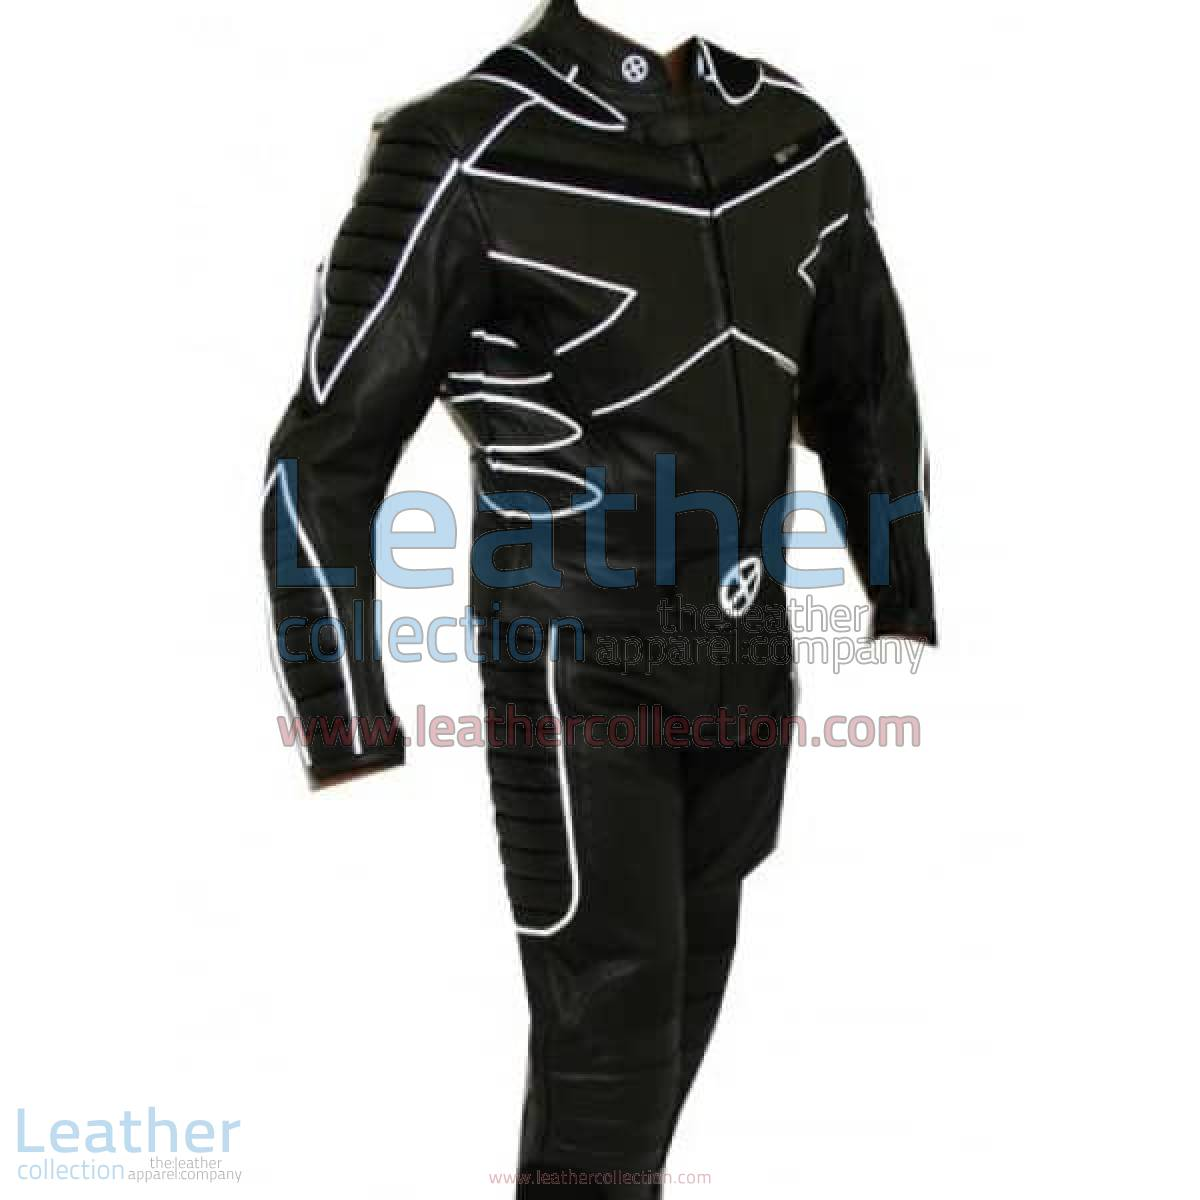 X-MEN Motorcycle Racing Leather Suit | x-men suit